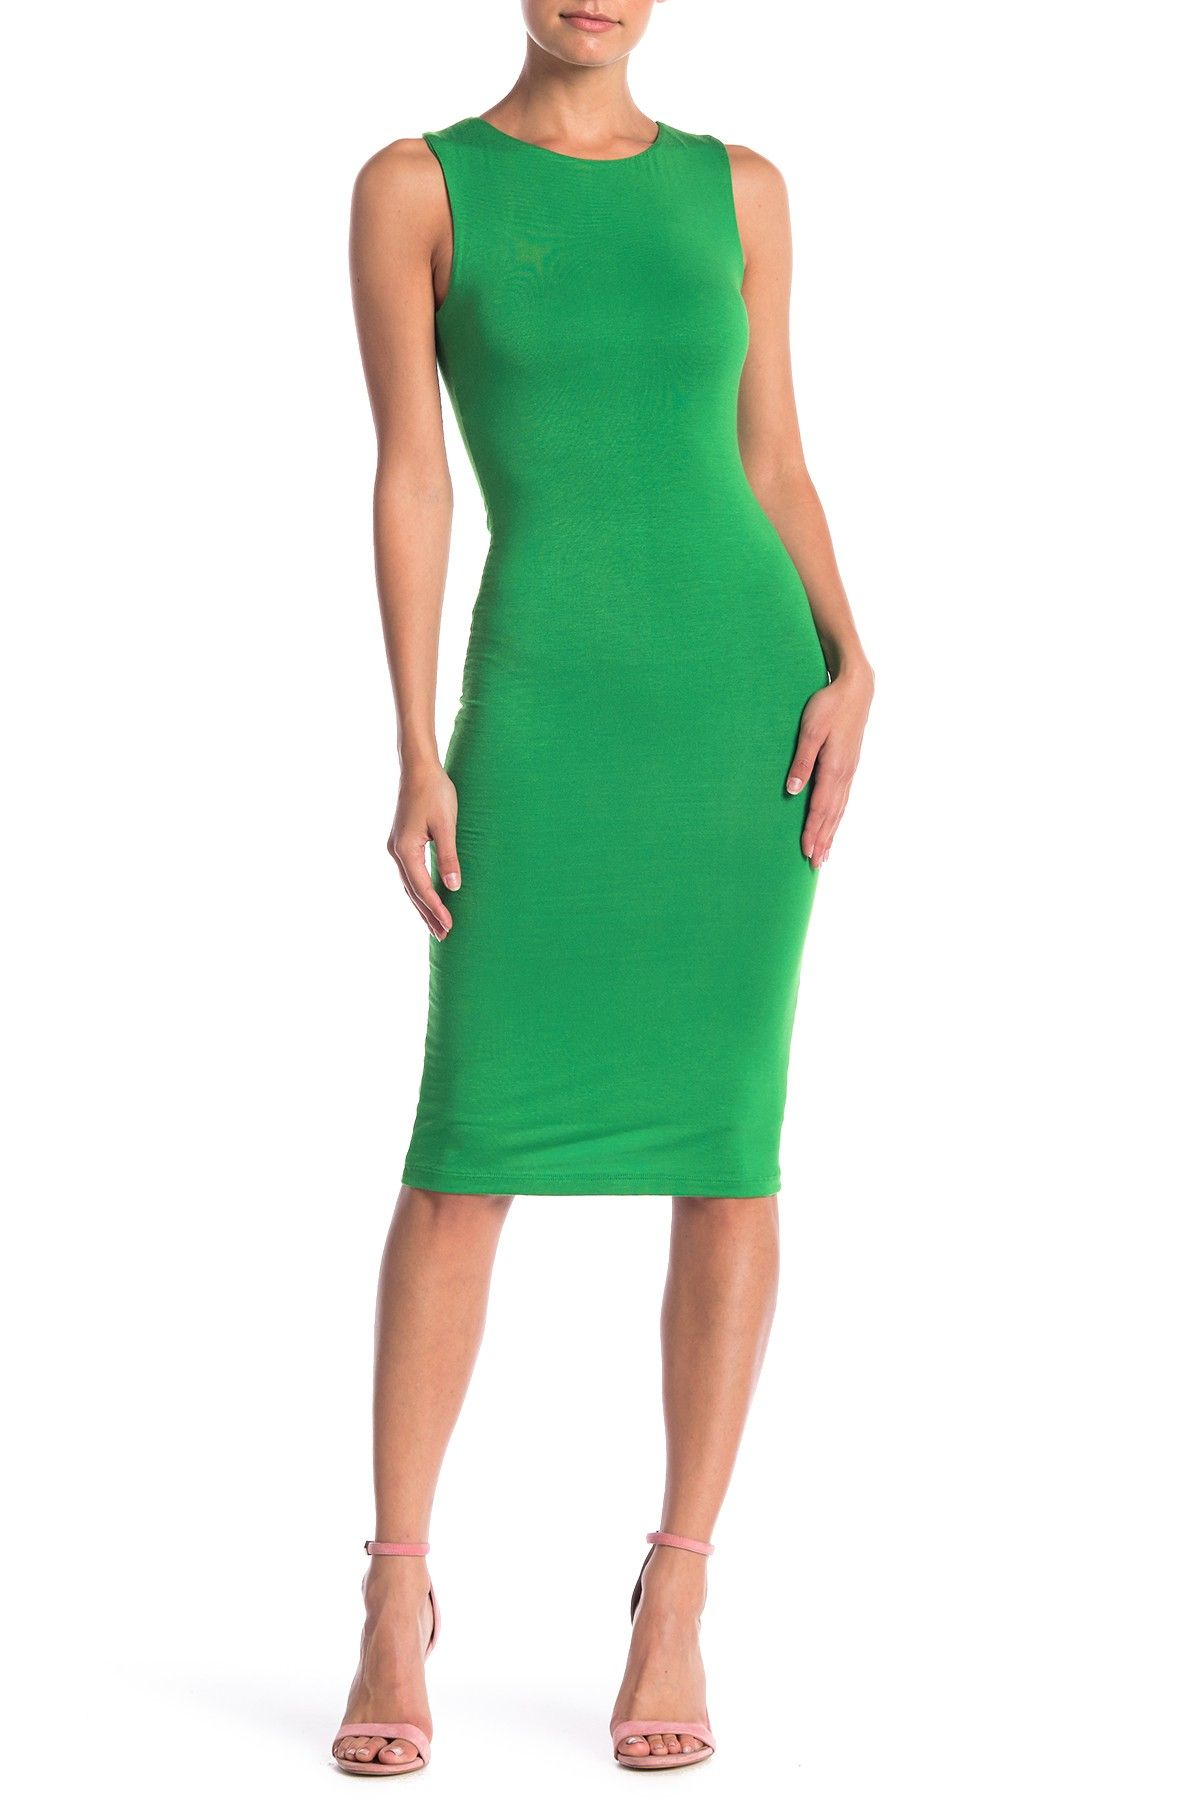 Velvet Torch Racerback Bodycon Midi Dress Nordstrom Rack Midi Dress Bodycon Dresses Midi Dress [ 1800 x 1200 Pixel ]